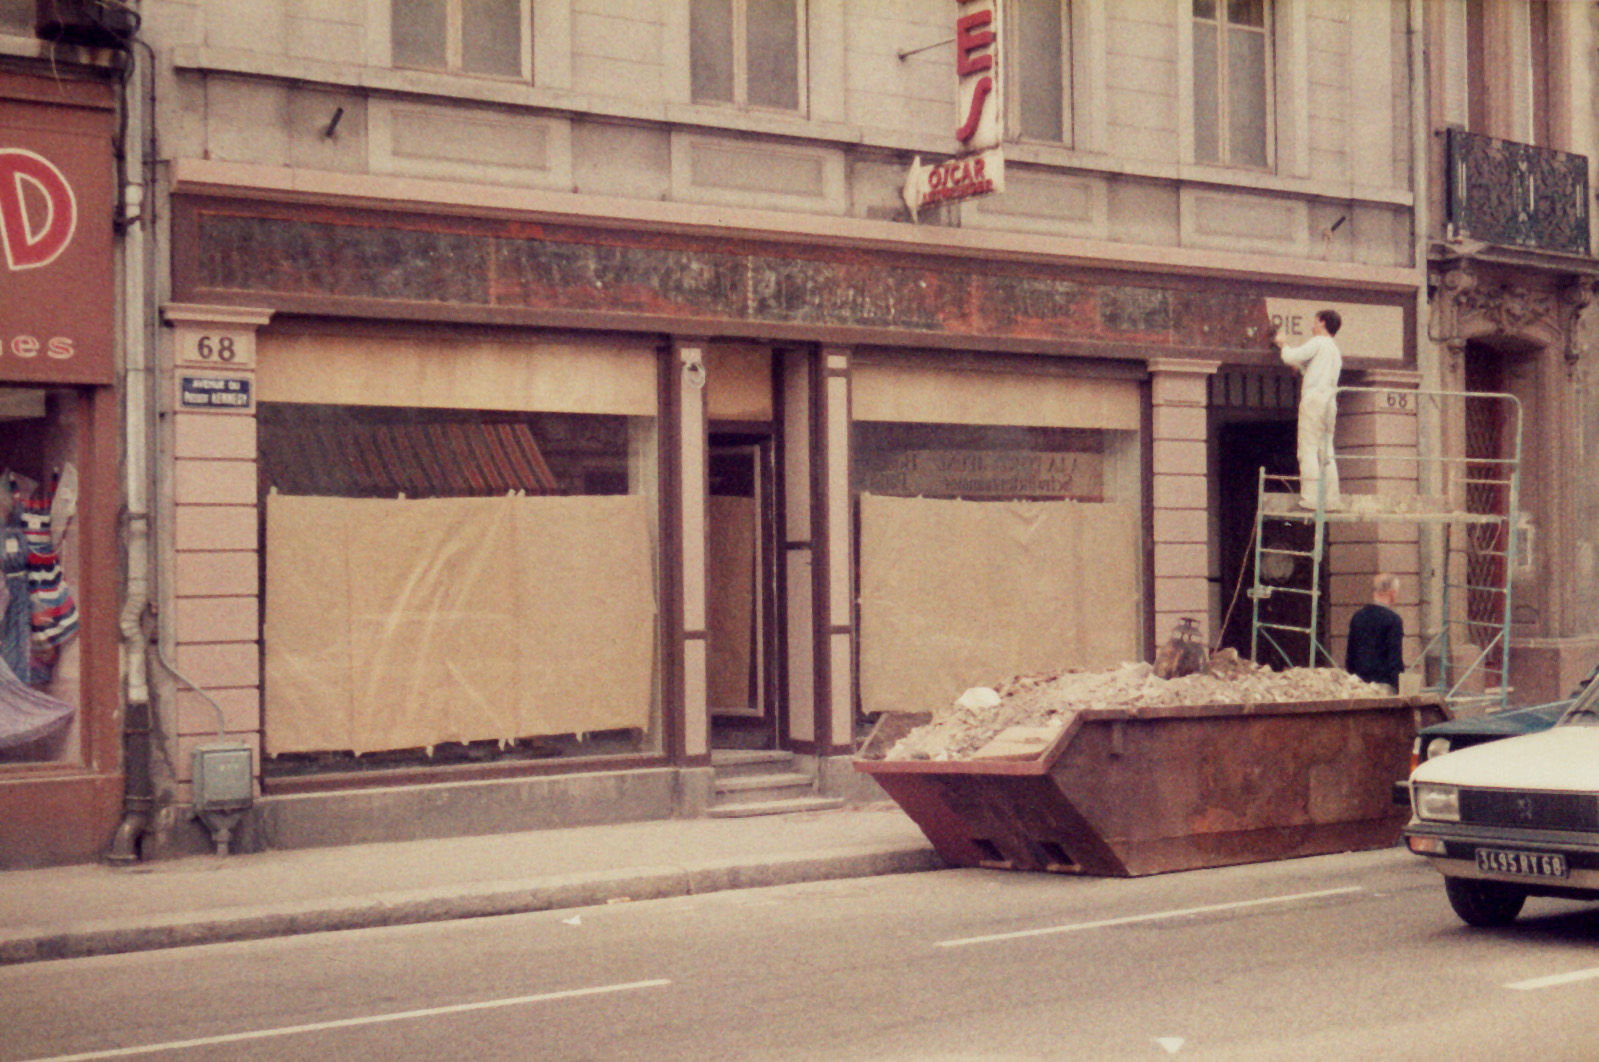 Travaux facade 68 en 1984